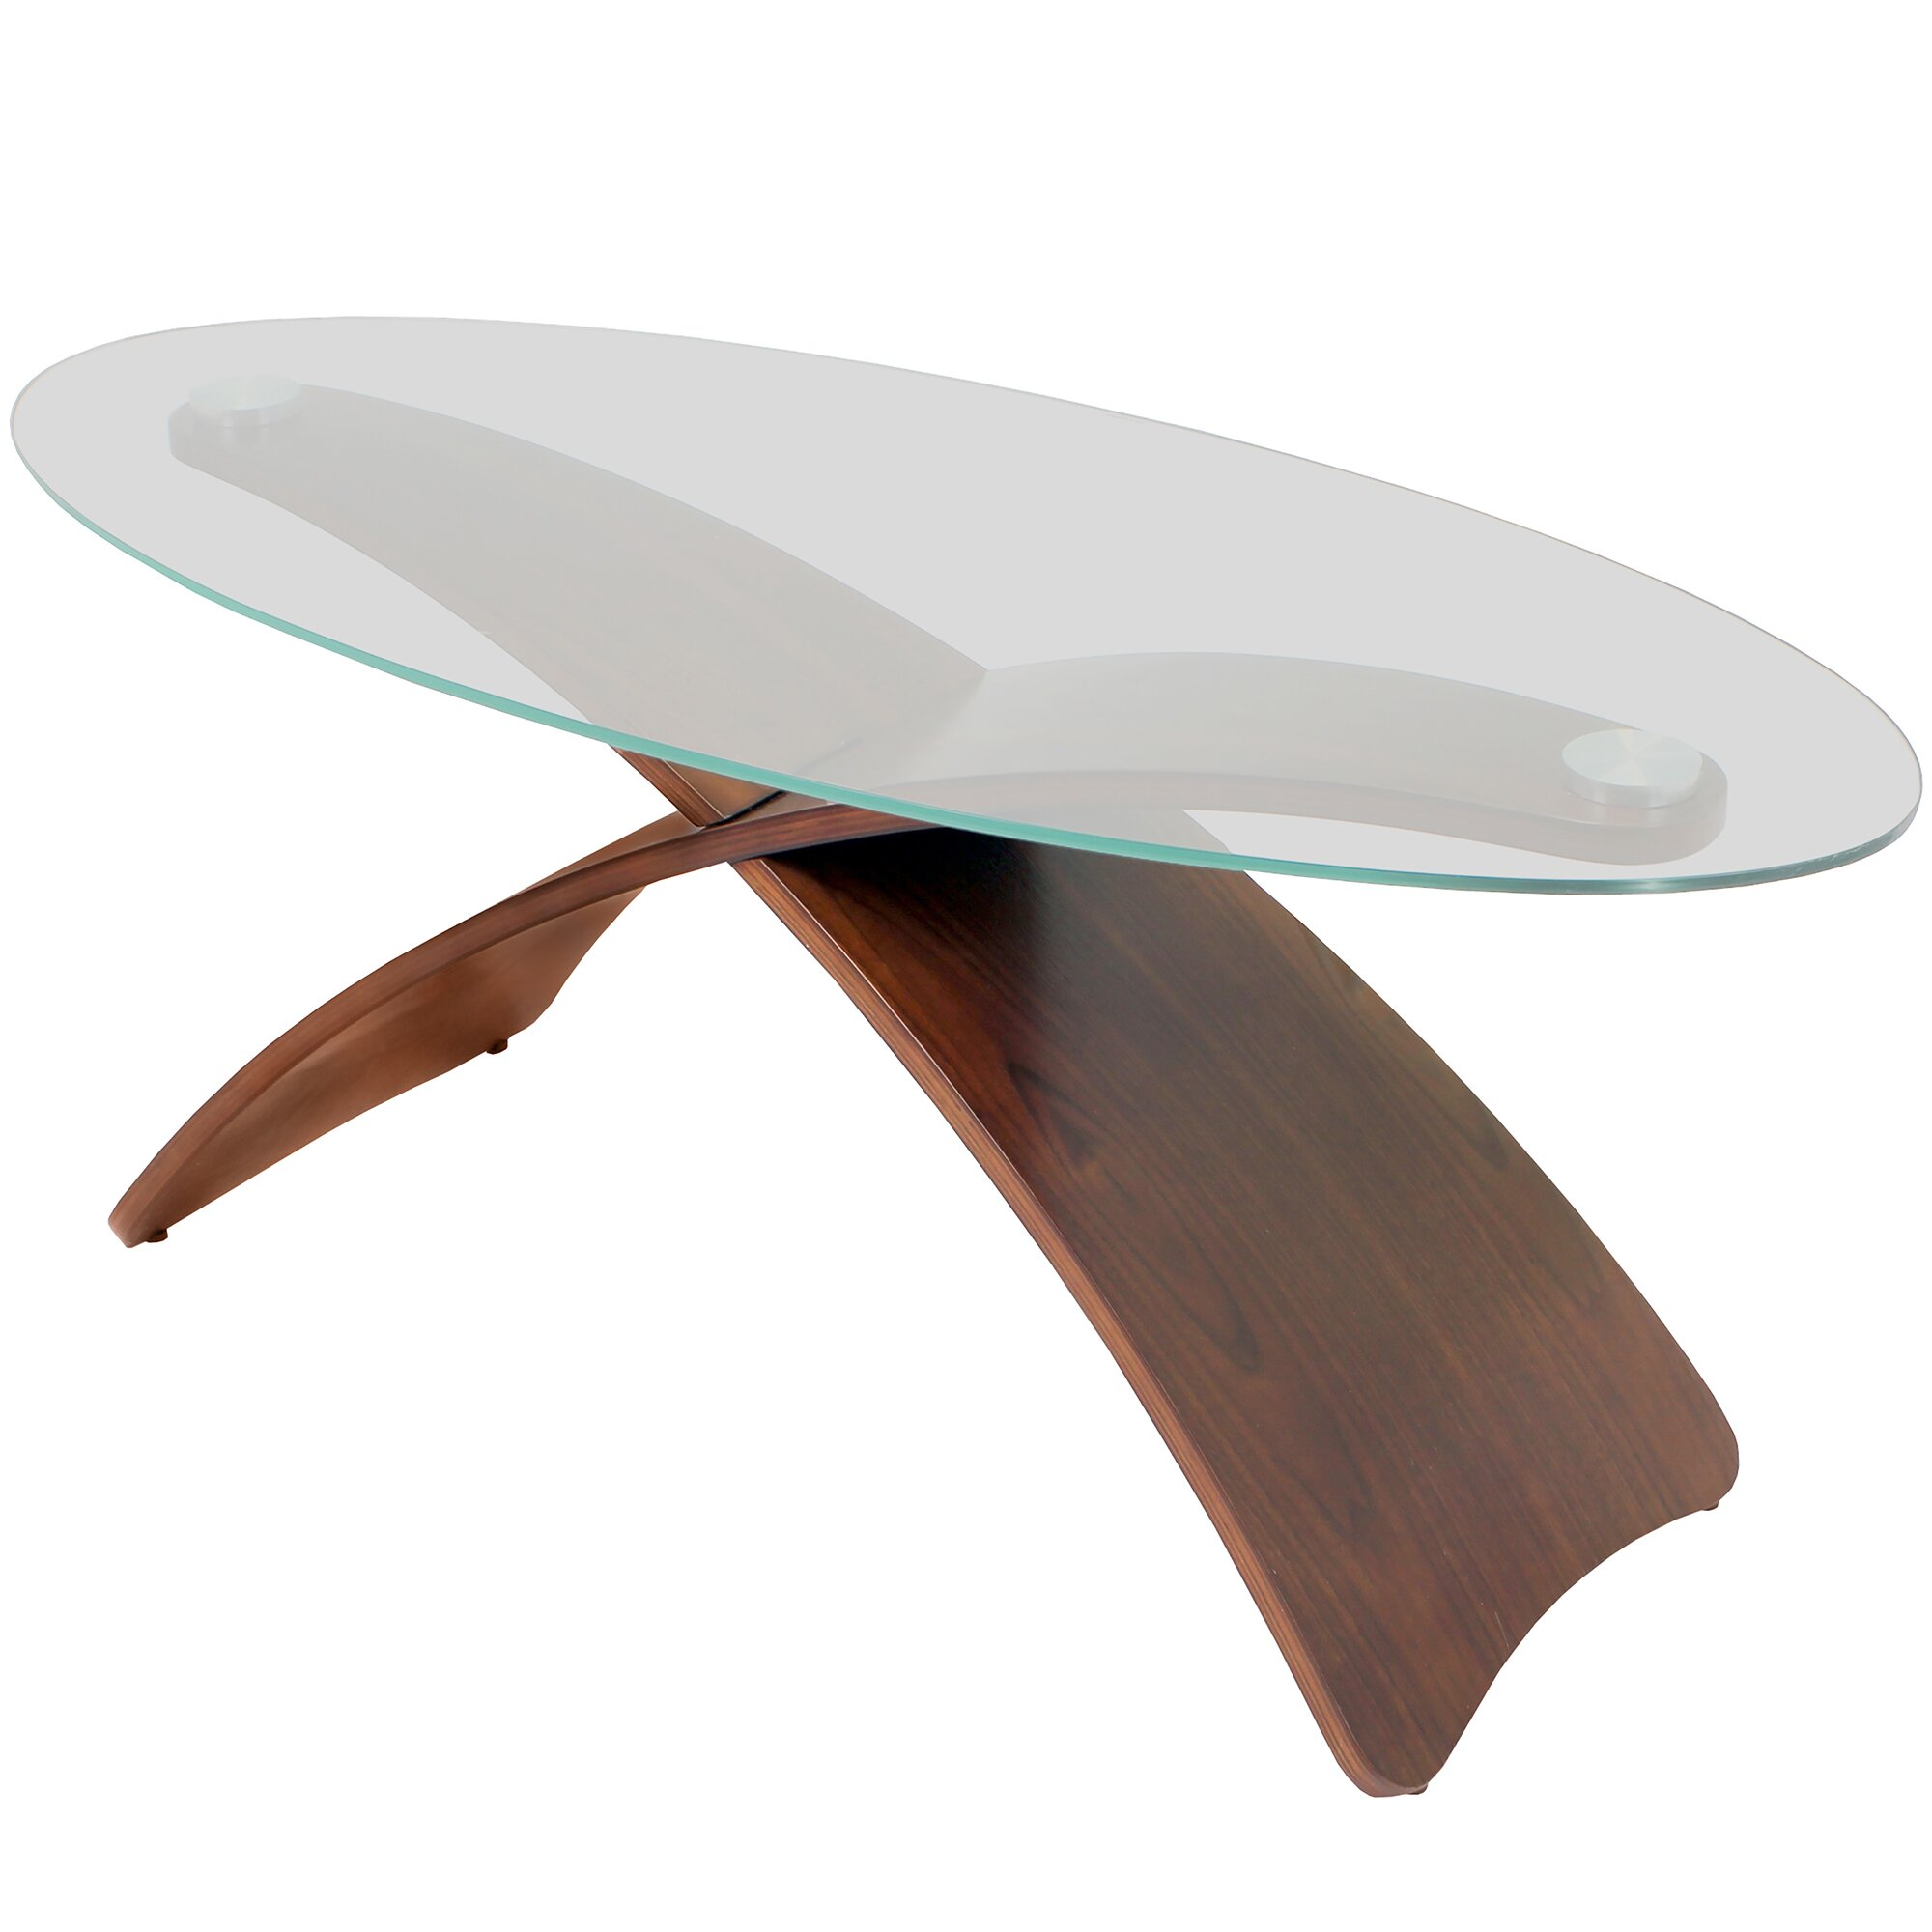 Lumisource Criss Cross Coffee Table Reviews Wayfair